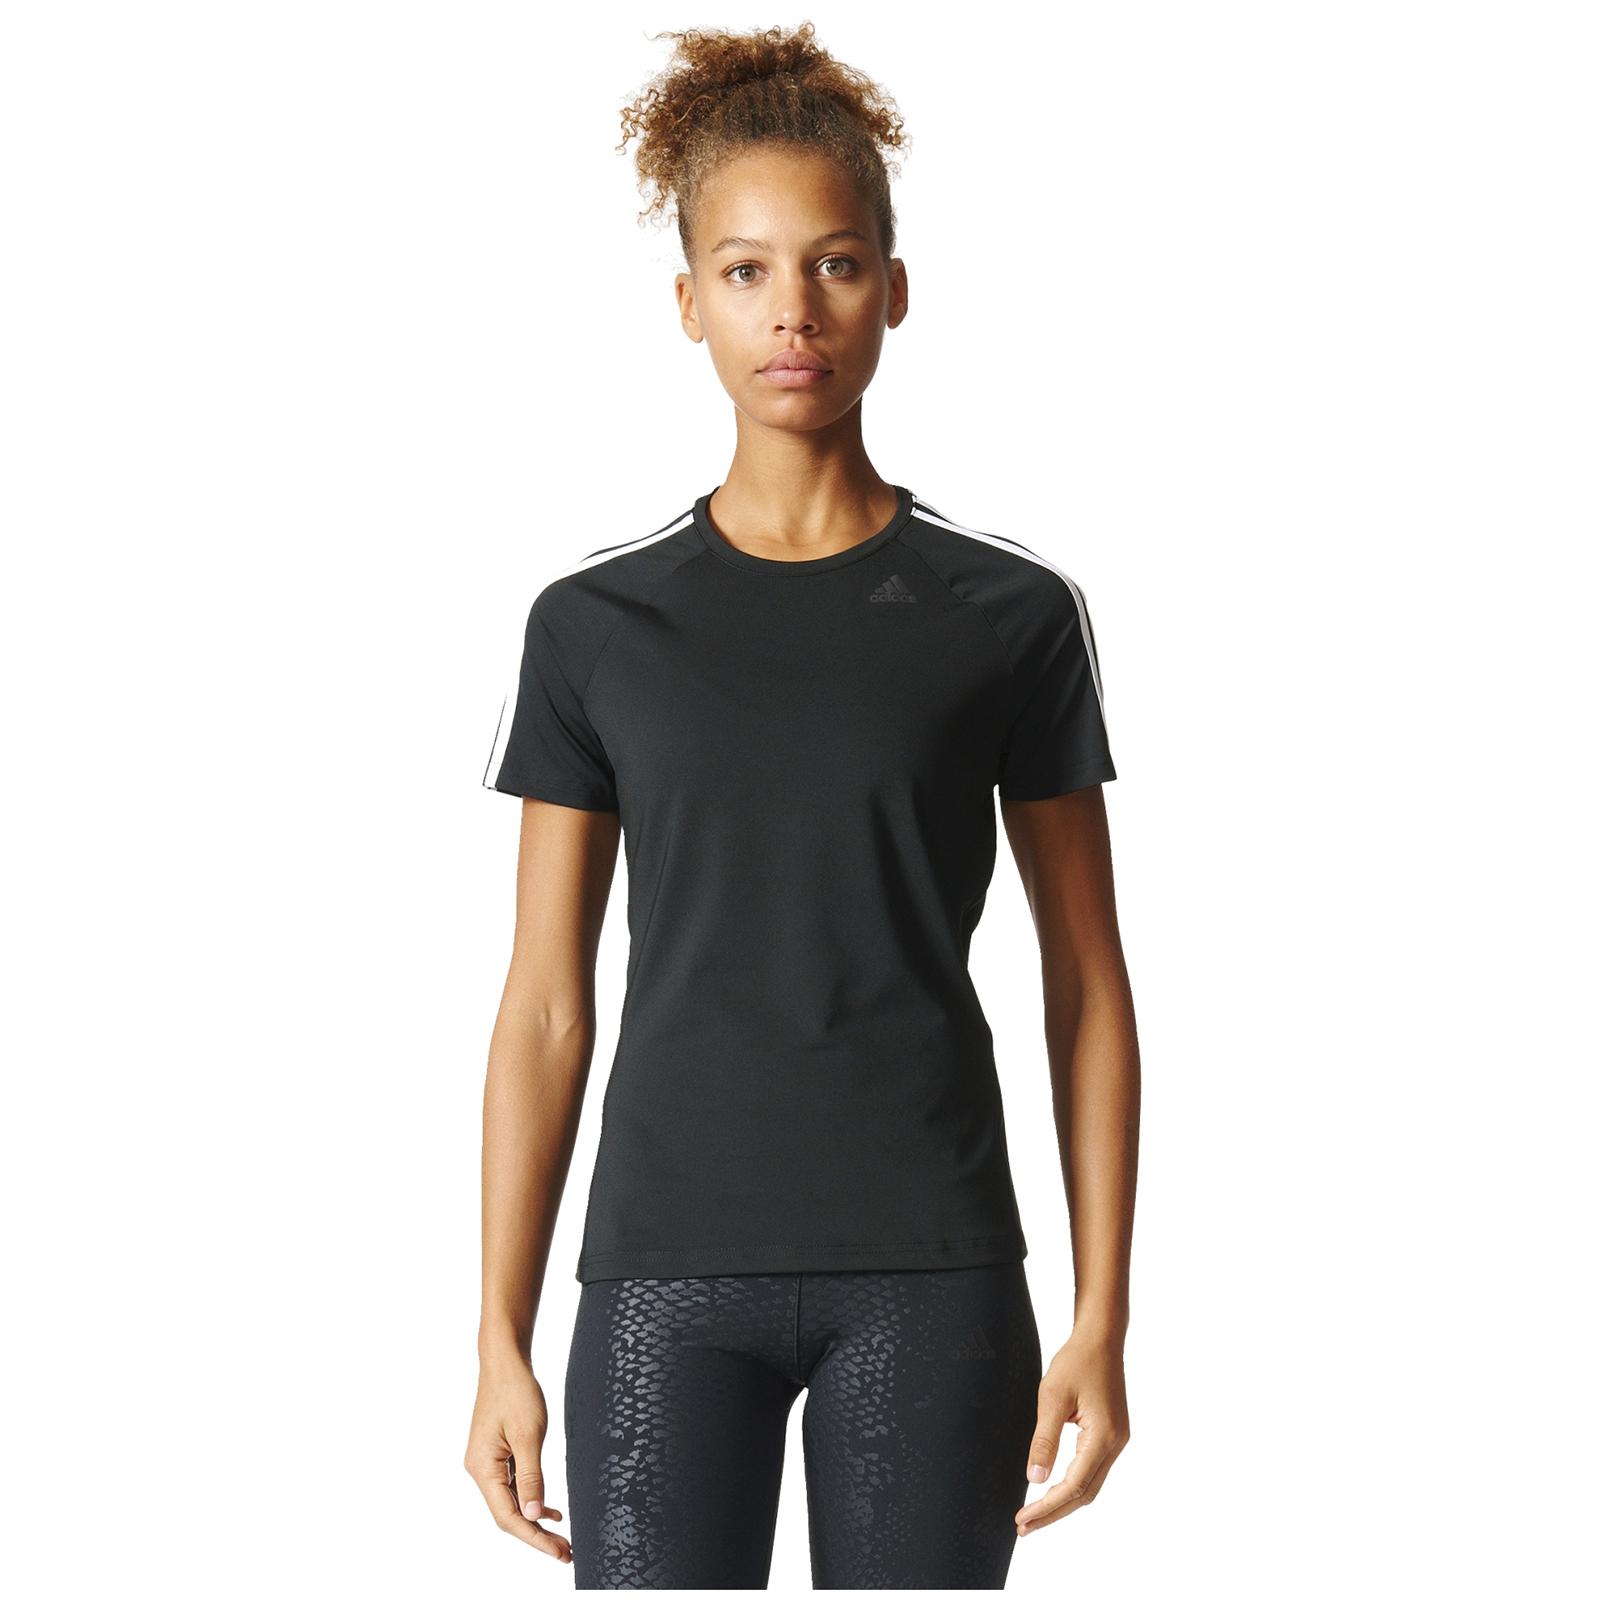 Adidas Women's D2M Solid Black Training T Shirt